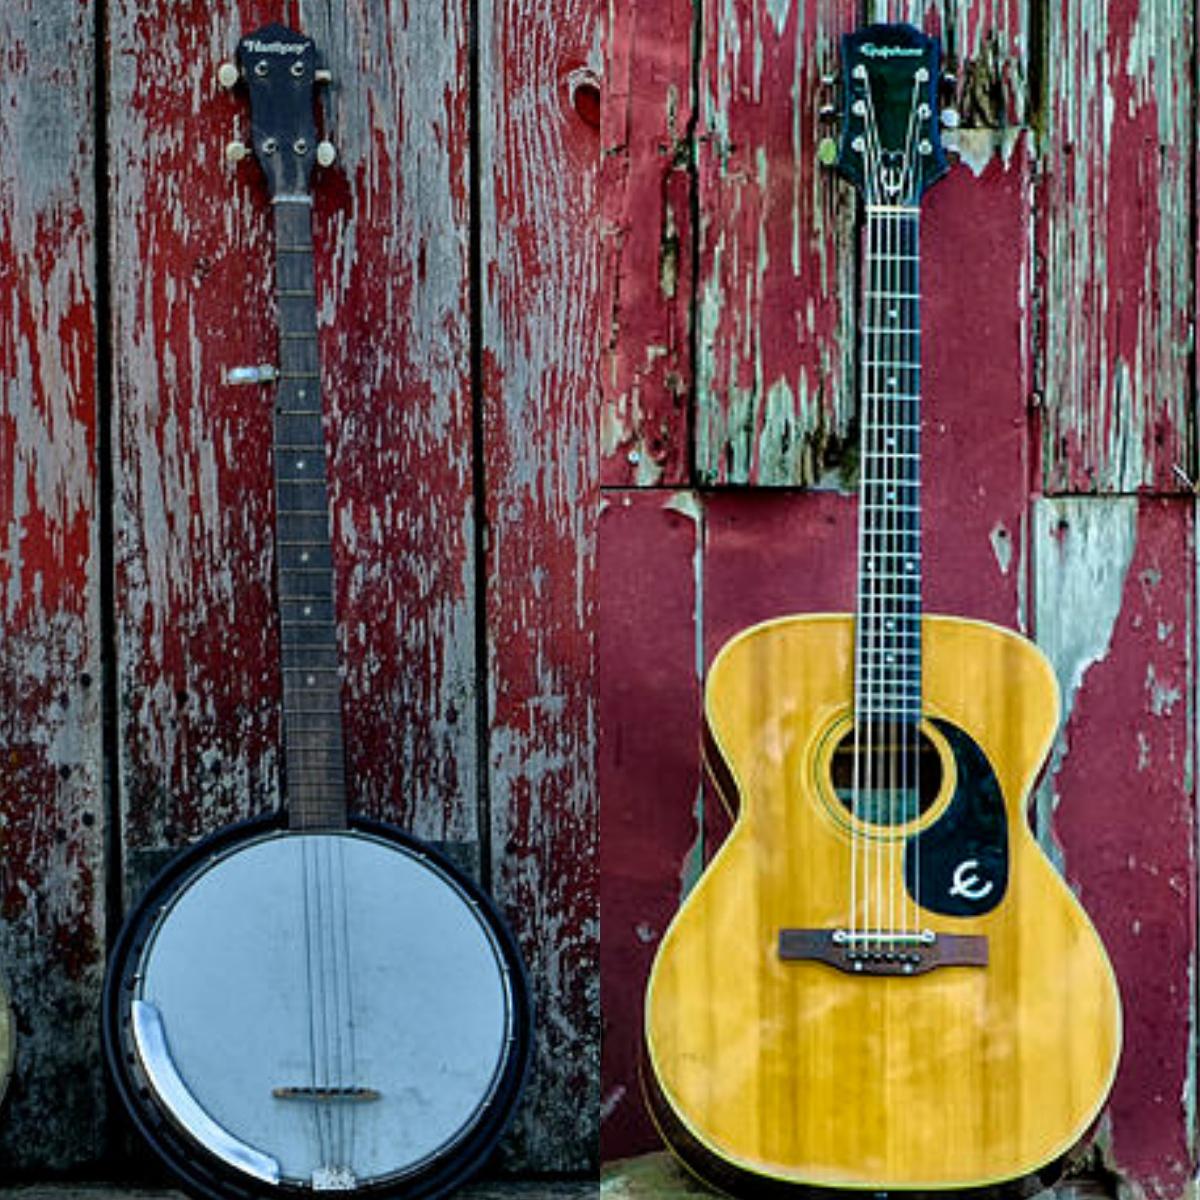 Banjo or guitar?